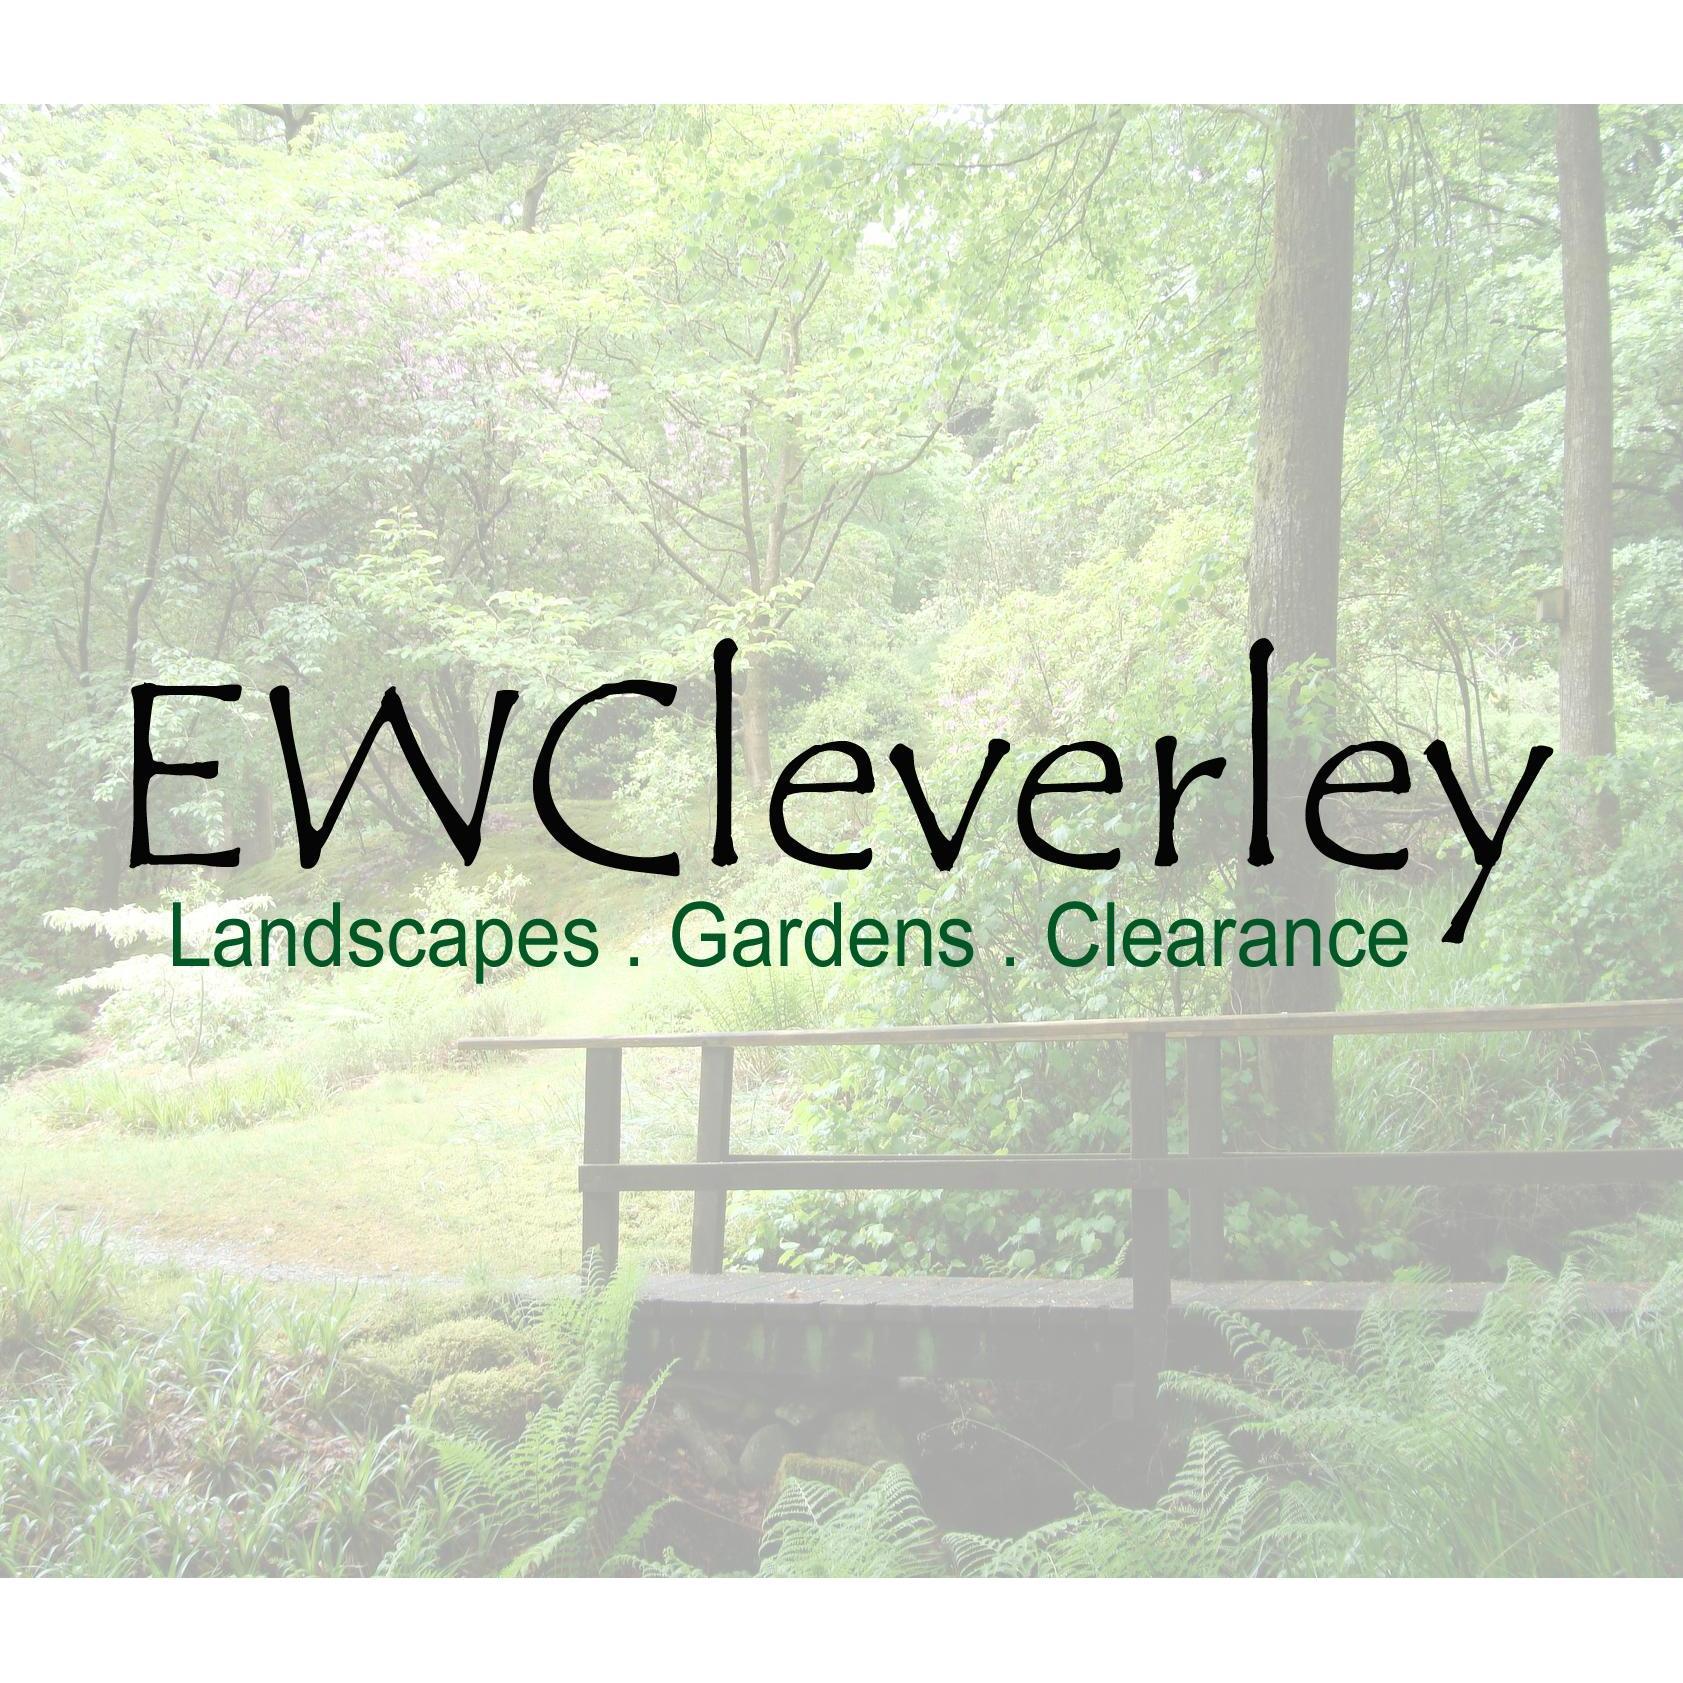 EWCleverley - St. Austell, Cornwall PL25 4NE - 07527 914257 | ShowMeLocal.com